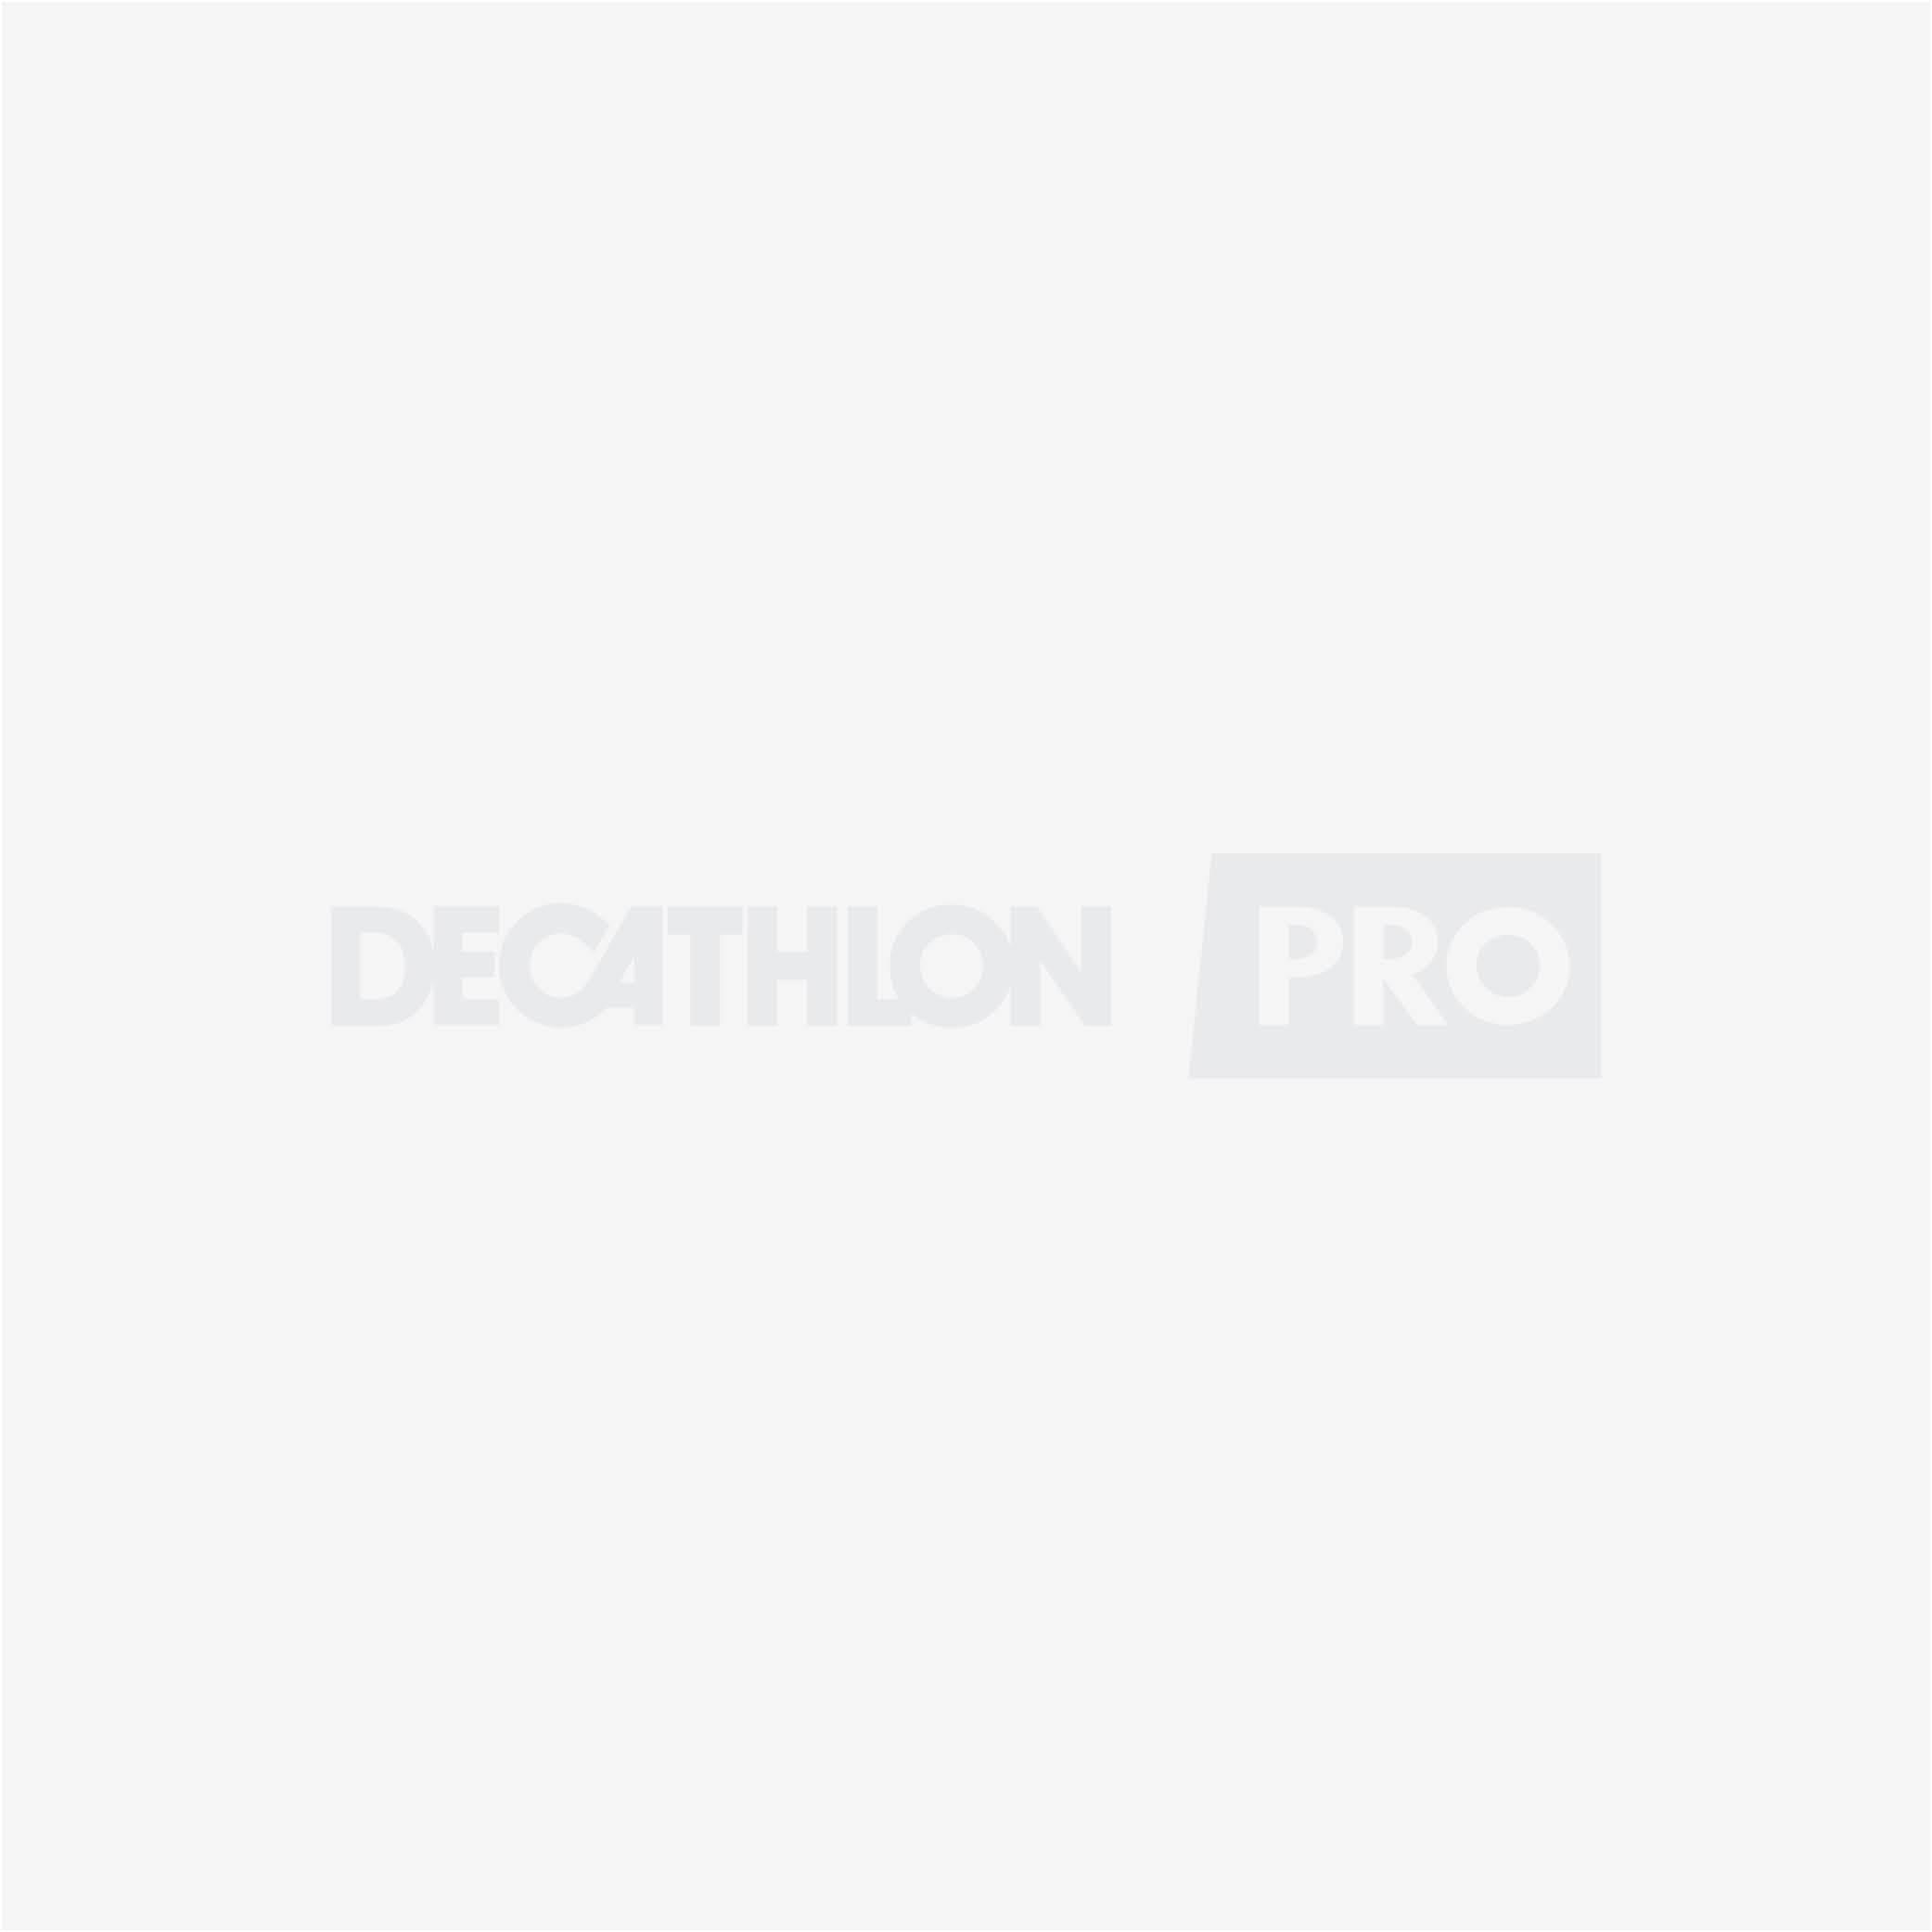 Facebook Decathlon Pro